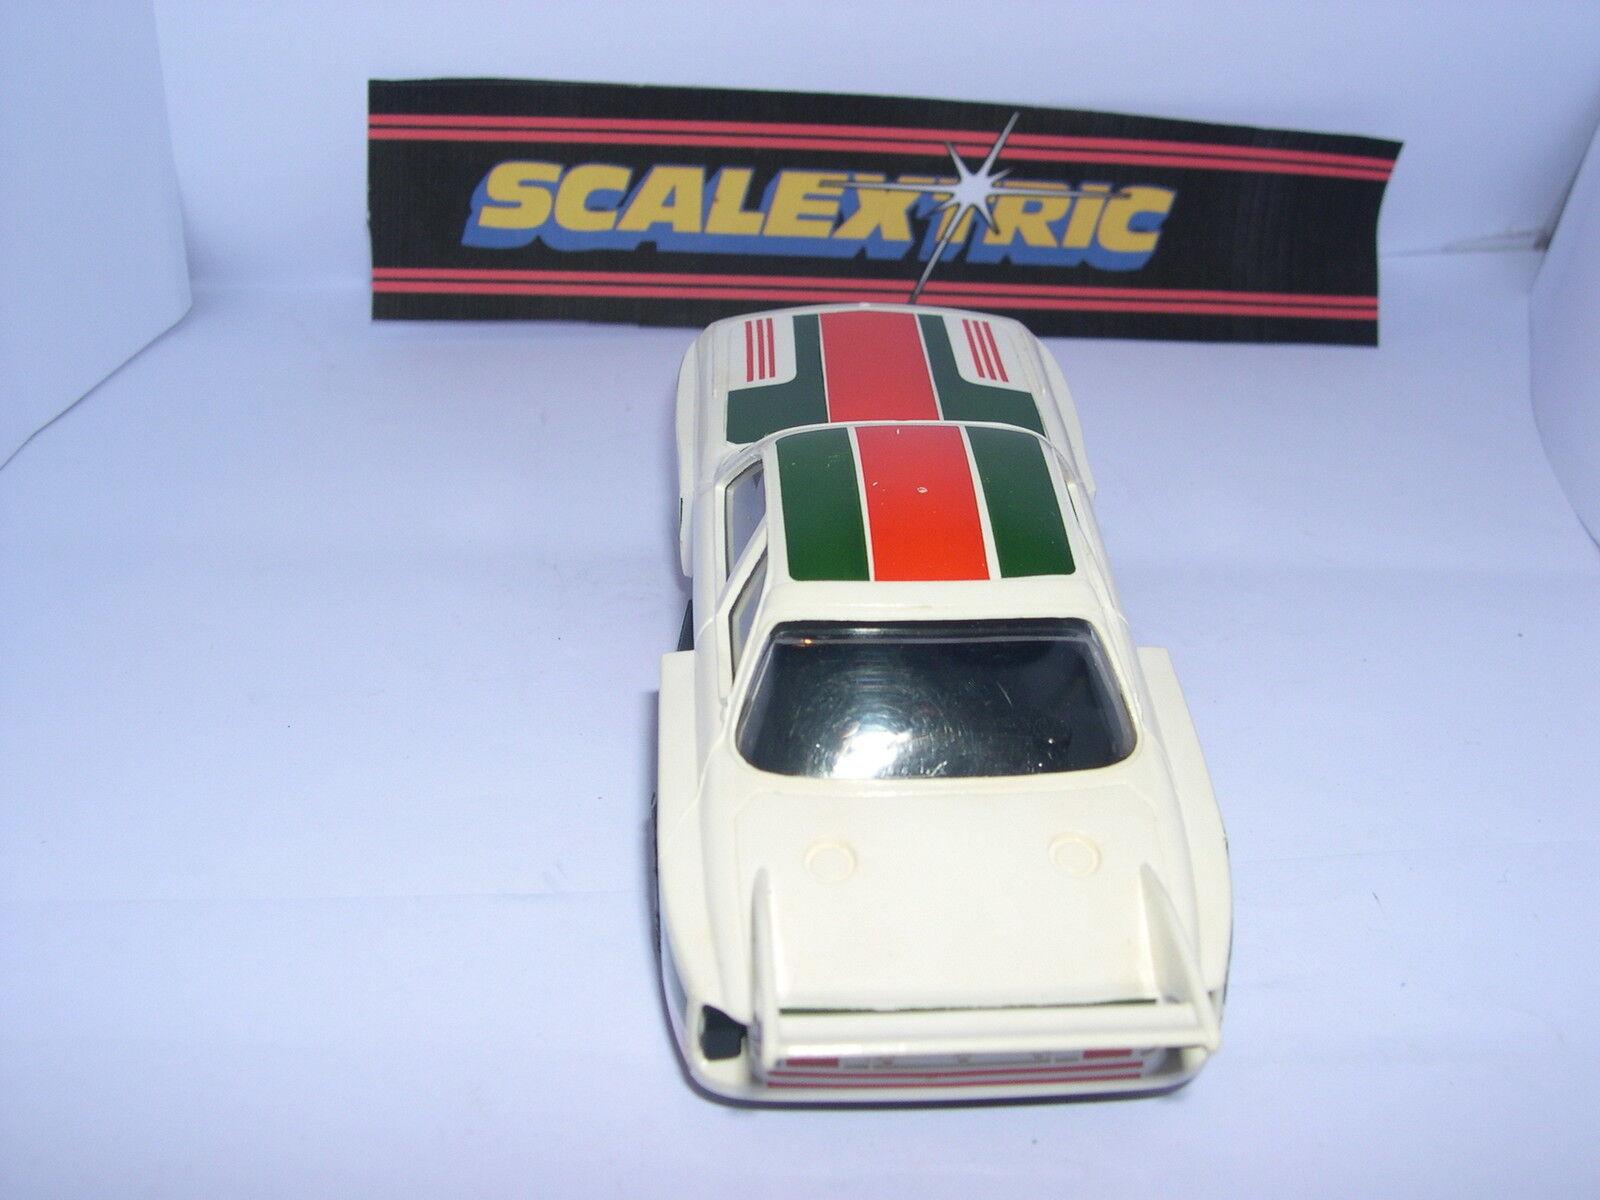 SCALEXTRIC C-116 SLOT CAR BMW 3.0 CSL EXCELLENT CONDITION UNBOXED UNBOXED UNBOXED 706a47